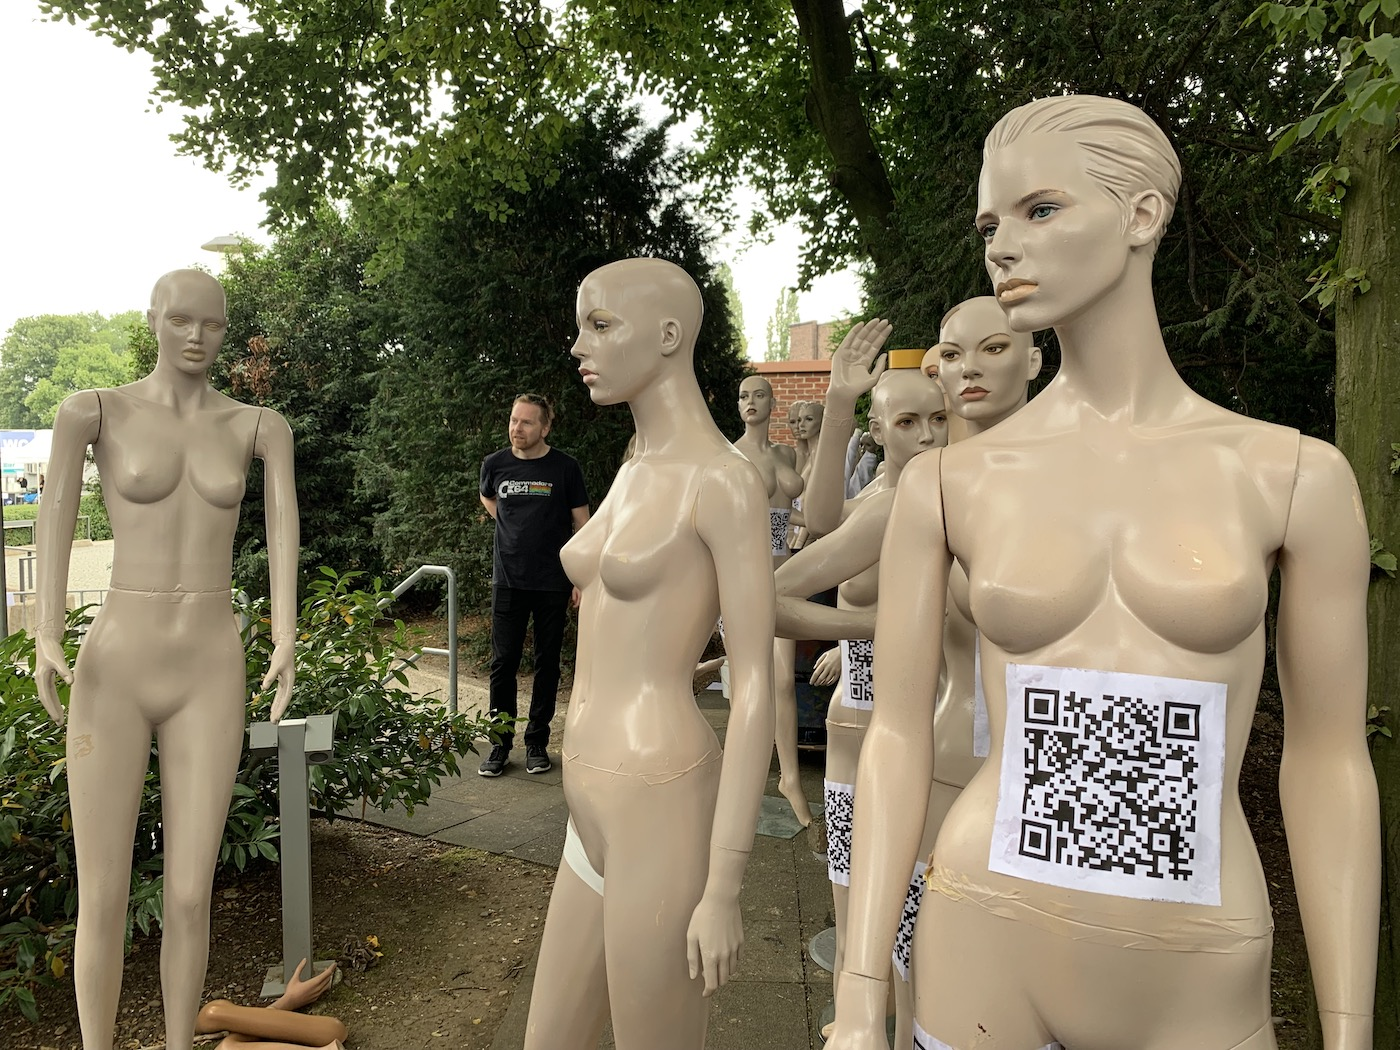 mark_benecke_amphi_festival_koeln_2019 - 130.jpg